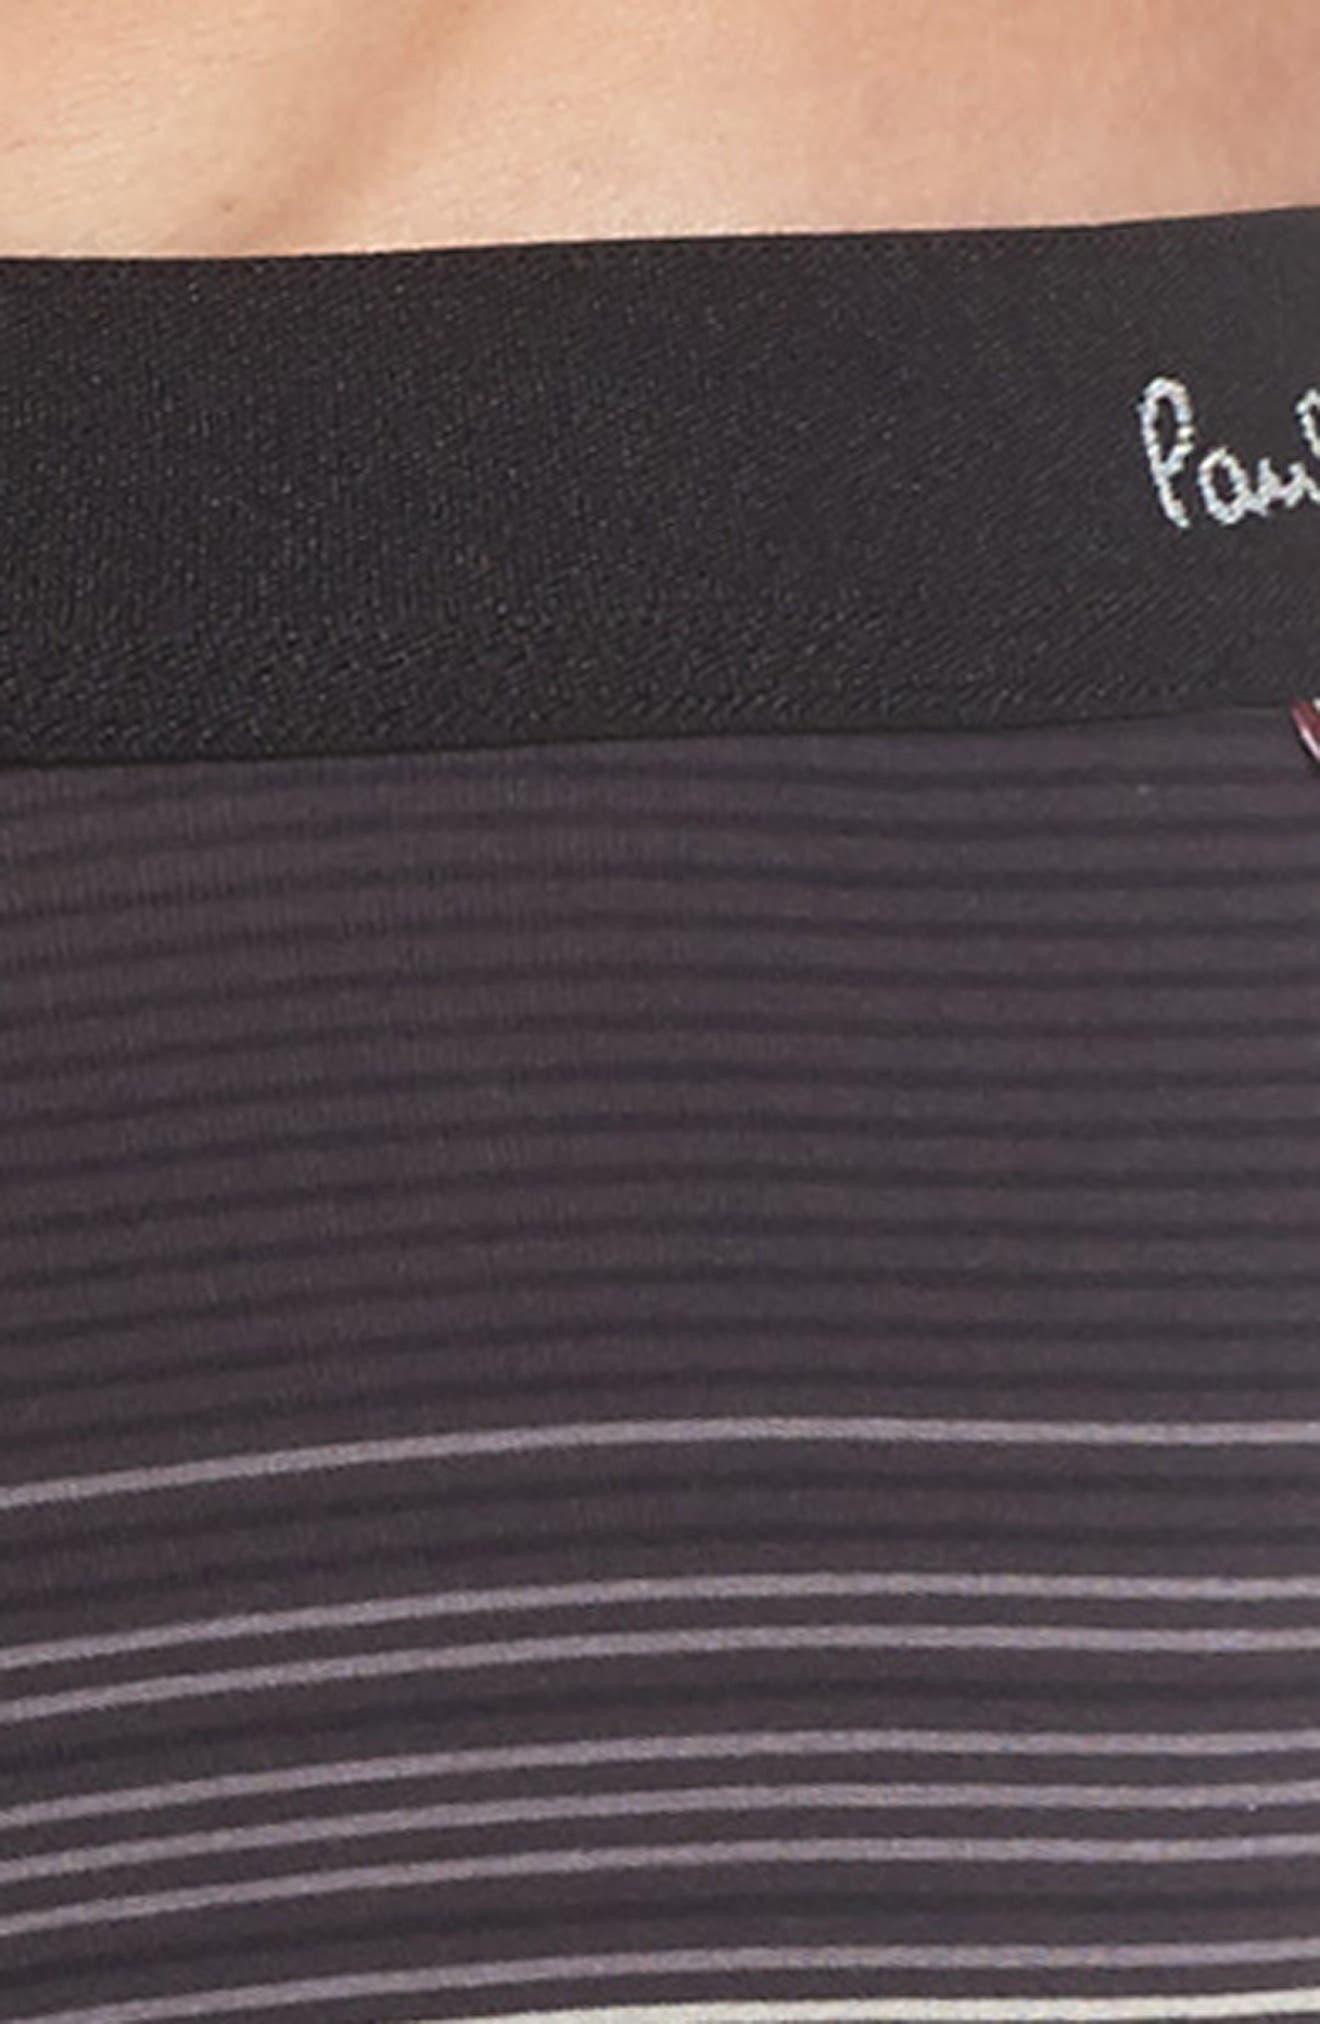 Stripe Stretch Cotton Trunks,                             Alternate thumbnail 4, color,                             Black